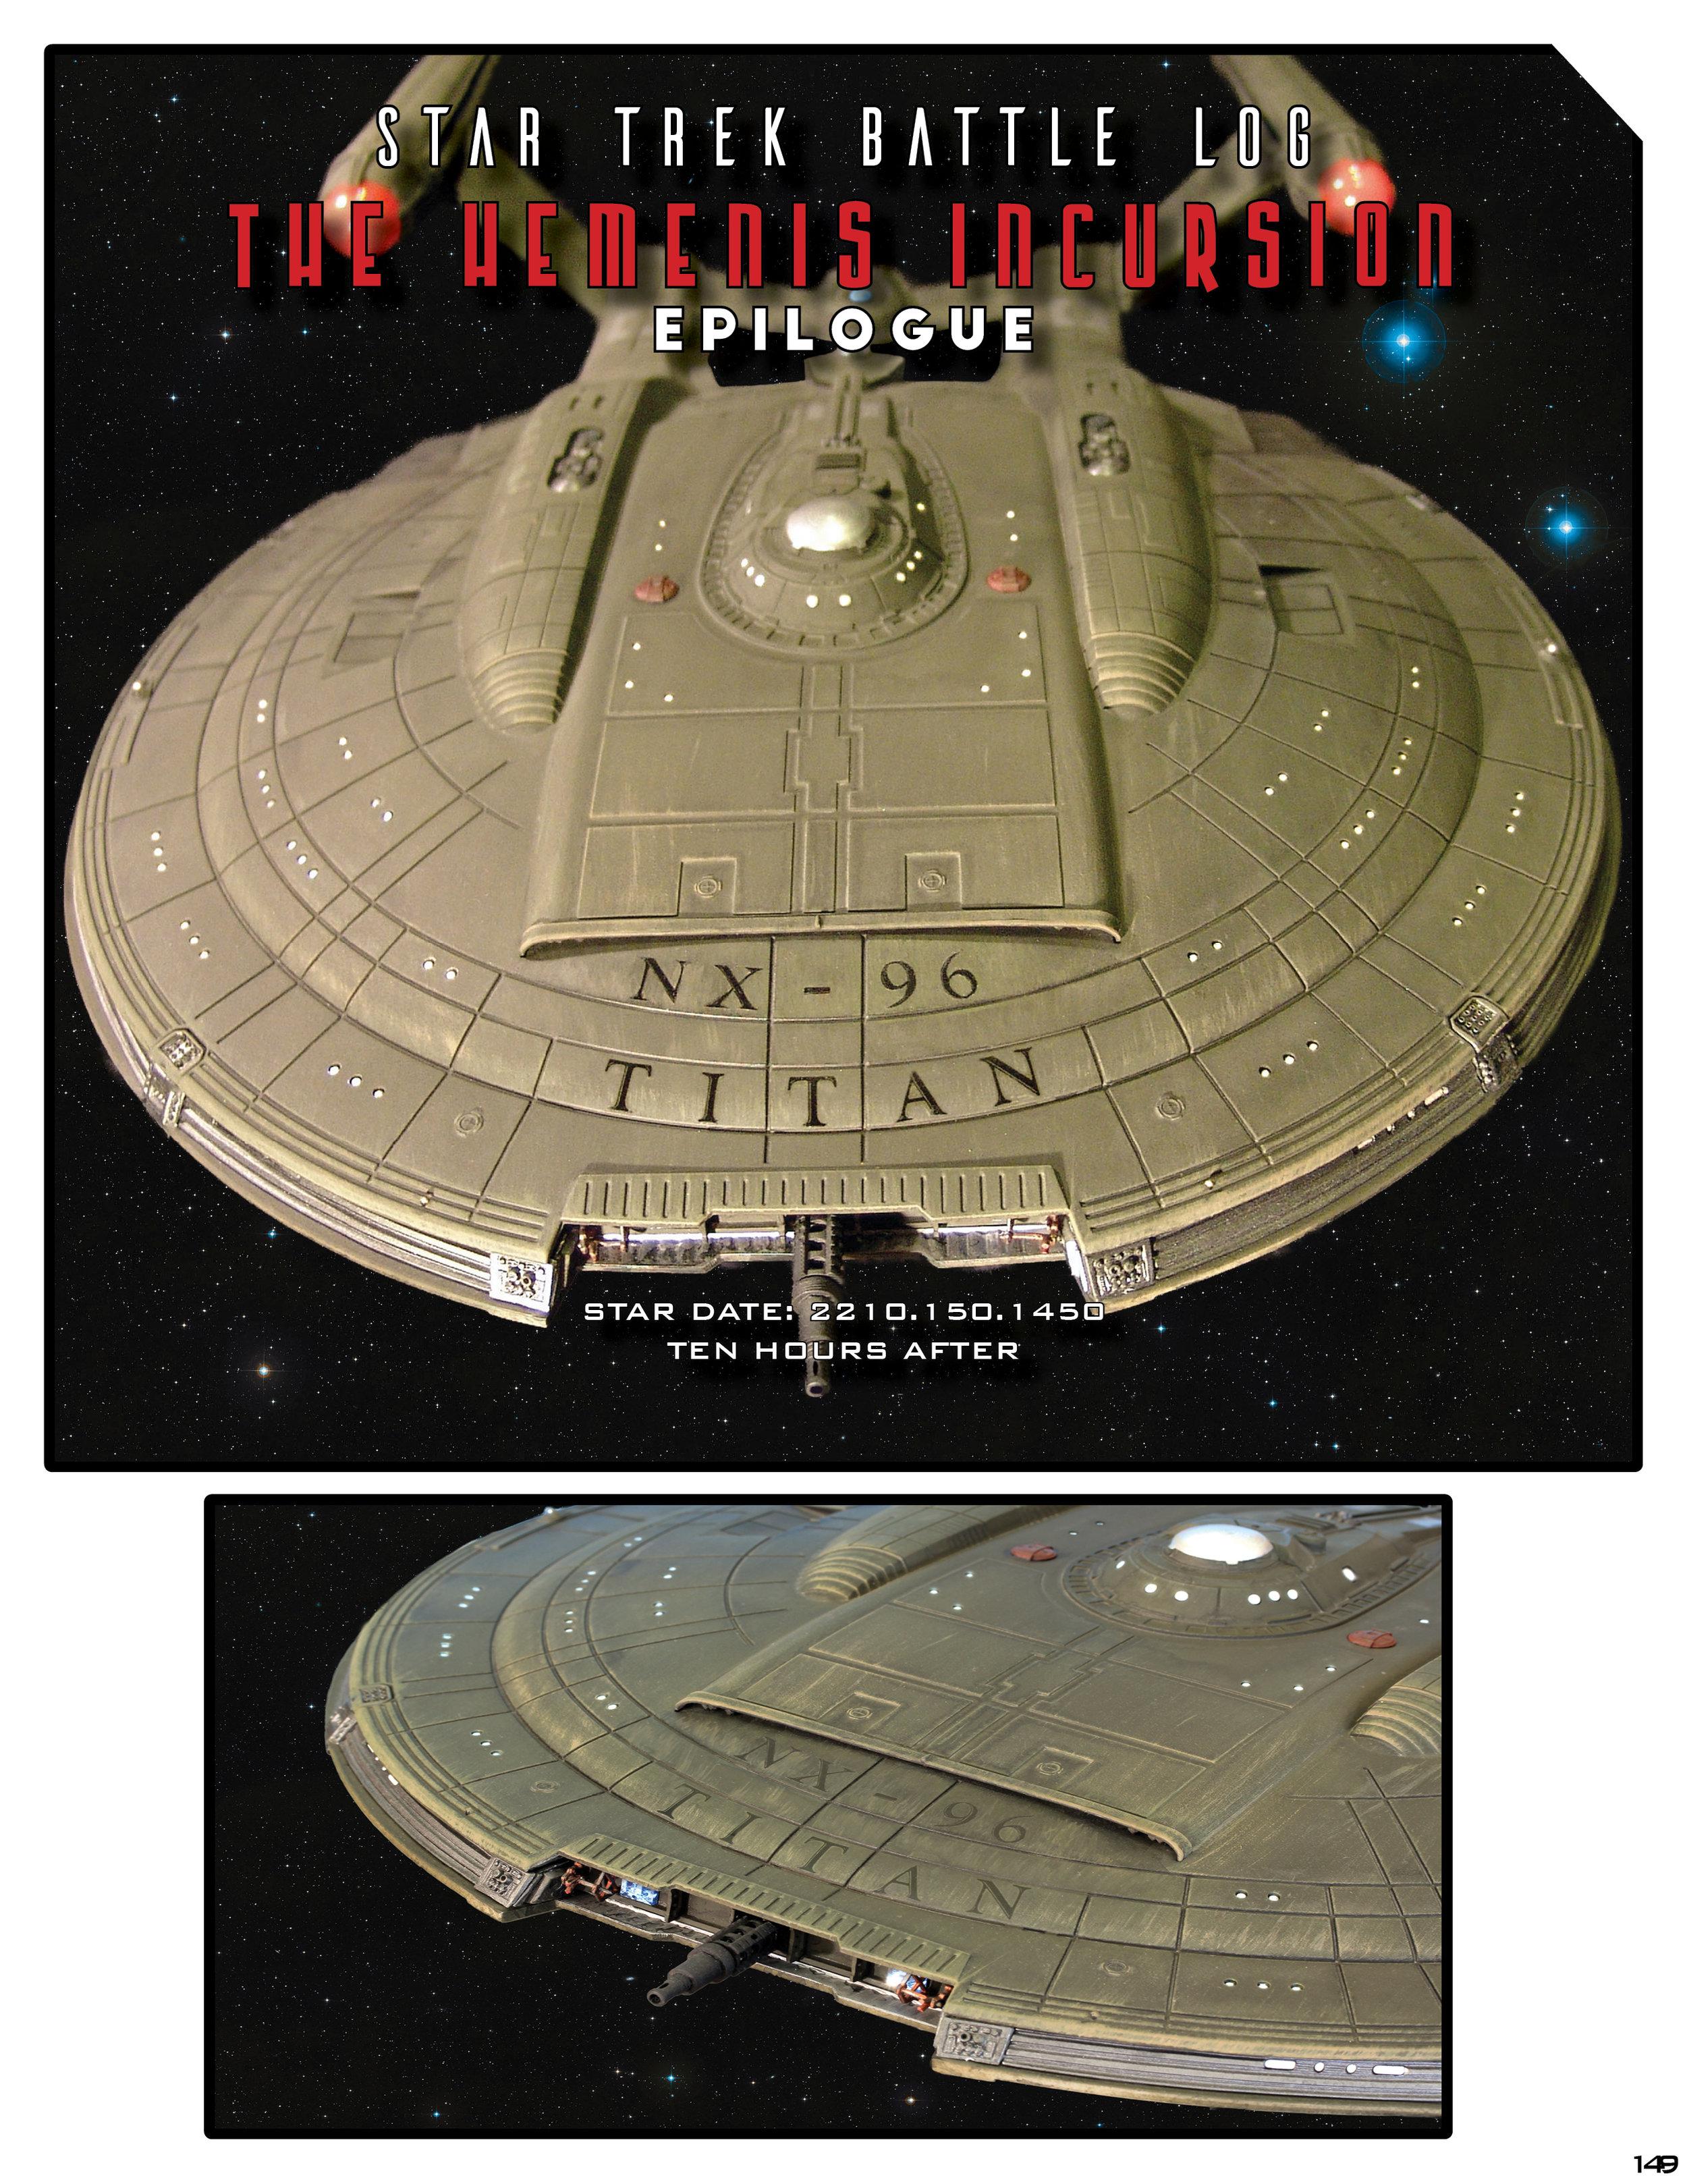 Star Trek_ Battle Logs Pages149.jpg